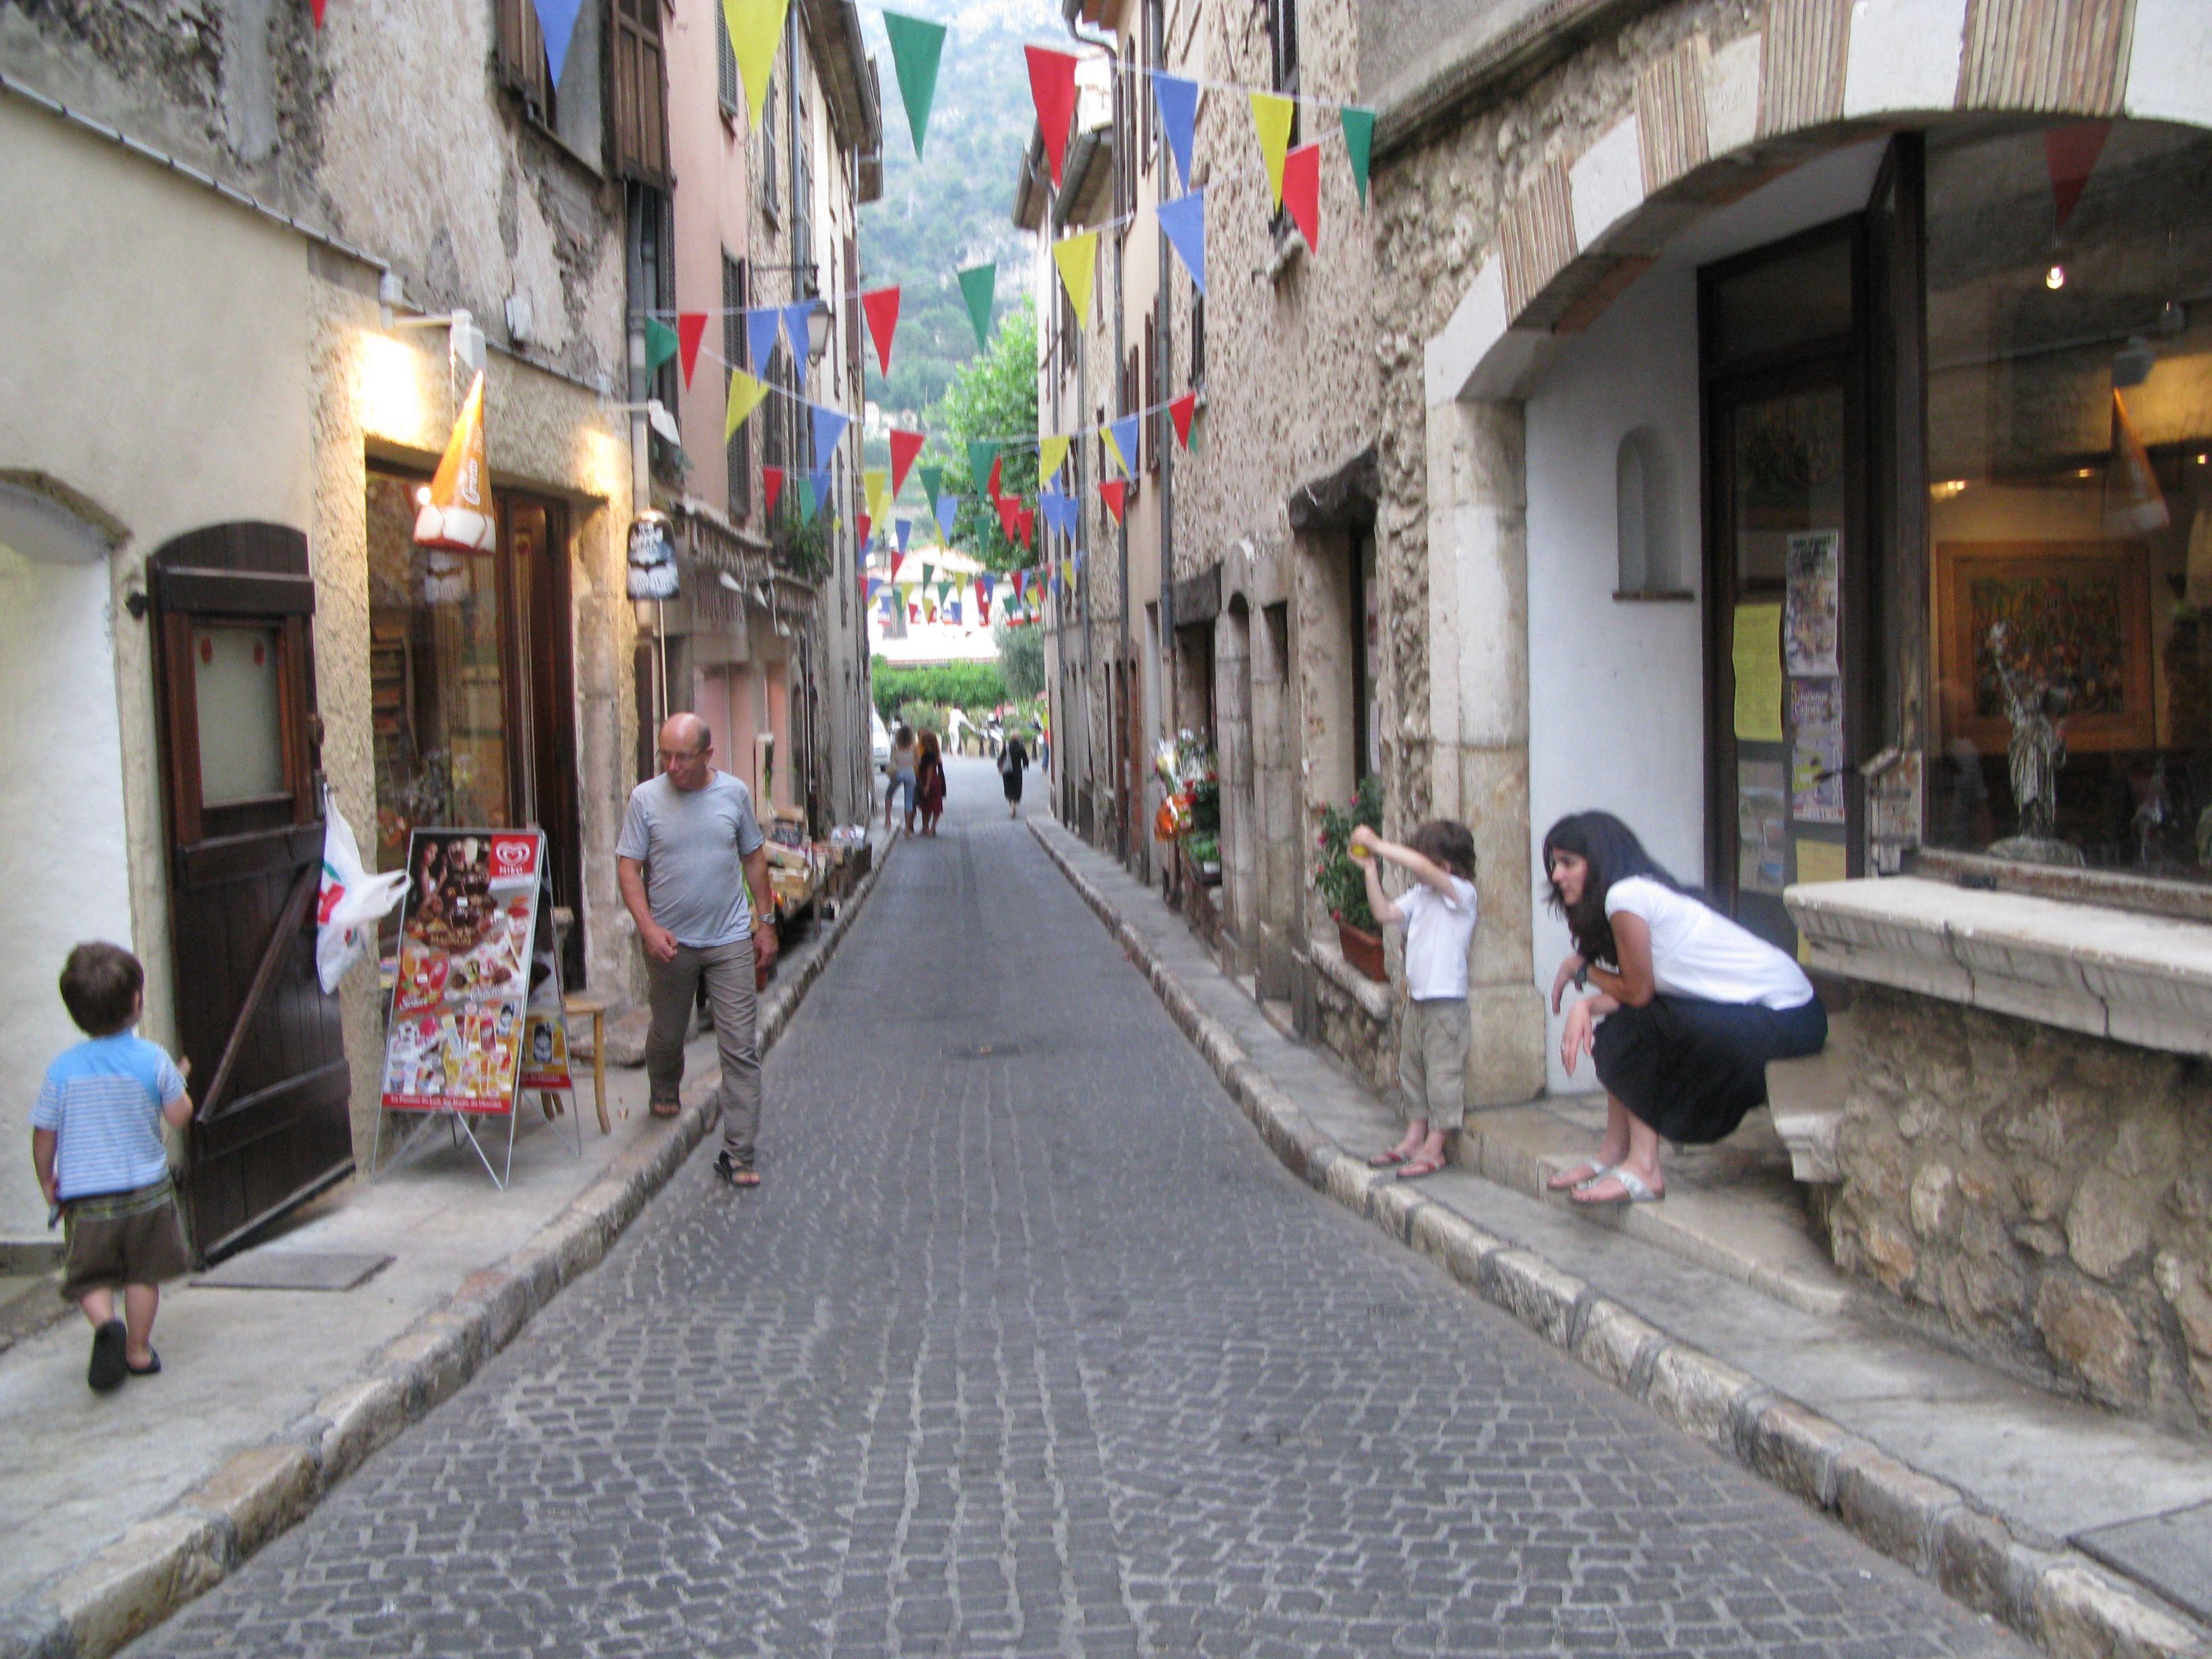 St Jeannet Streets St Jeannet France